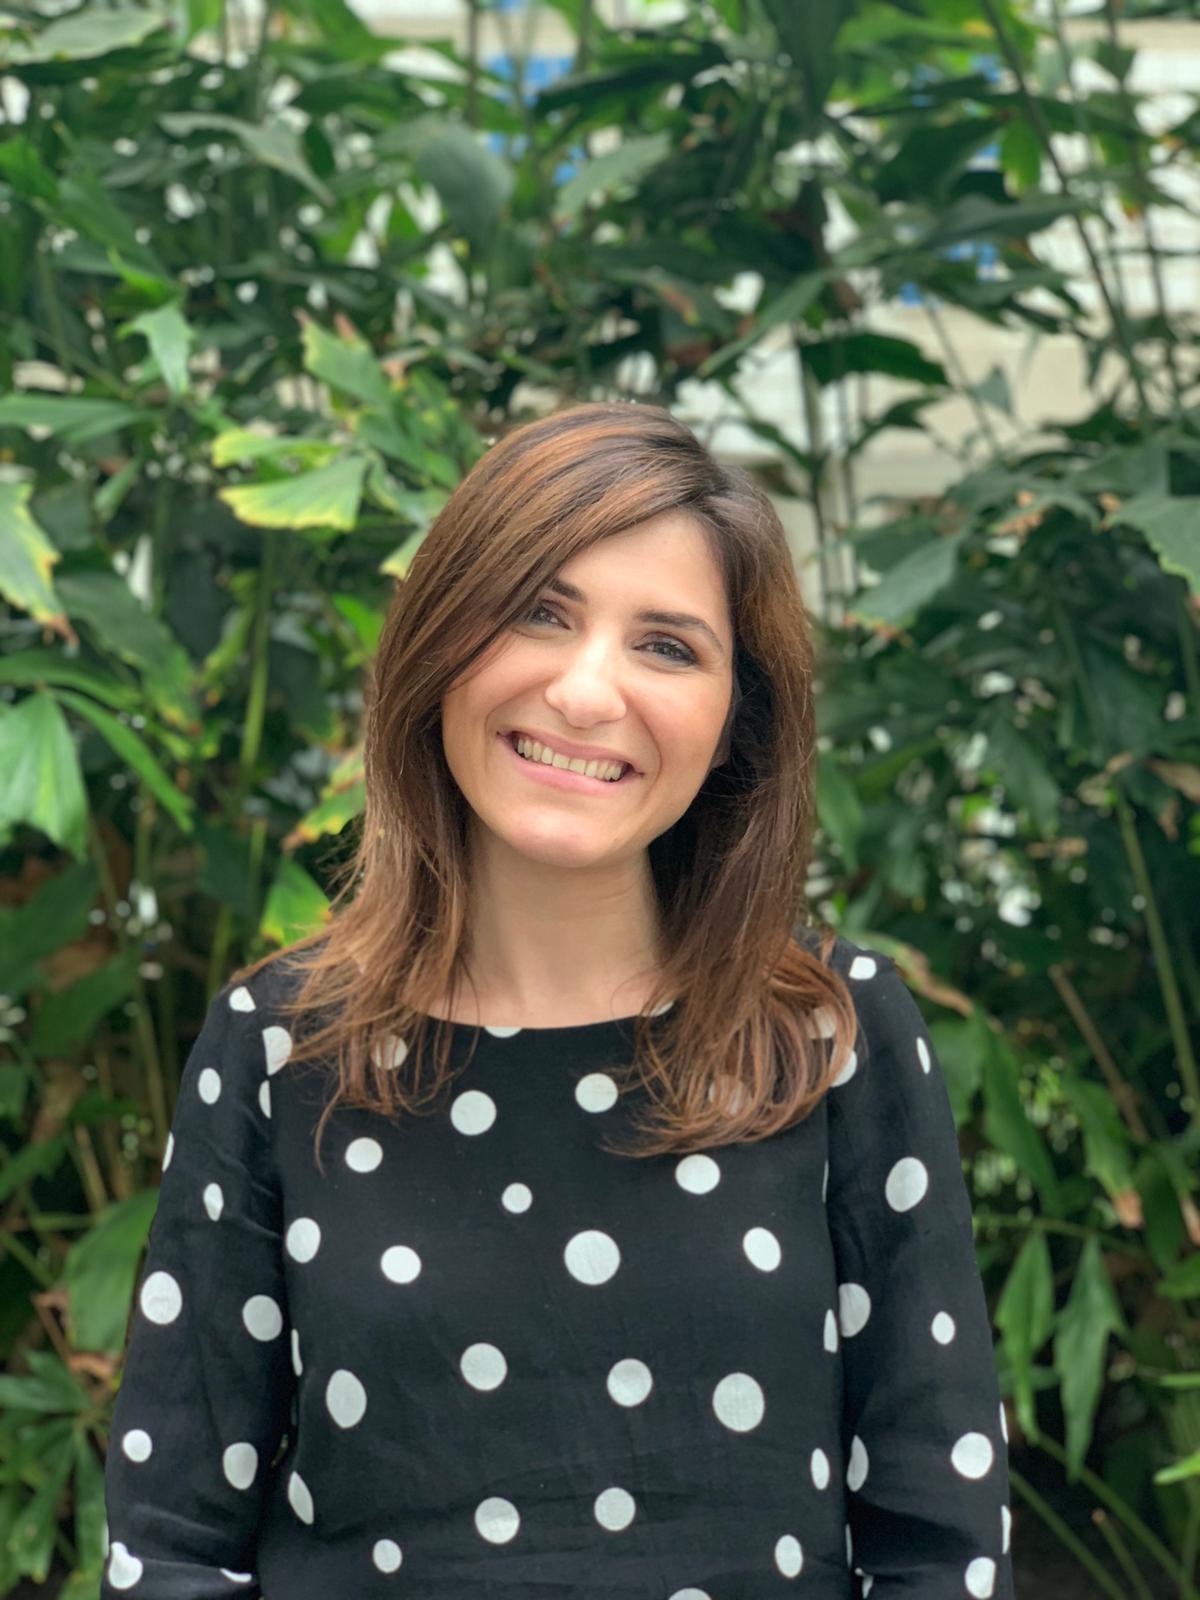 Natalie Terzikhan, PhD